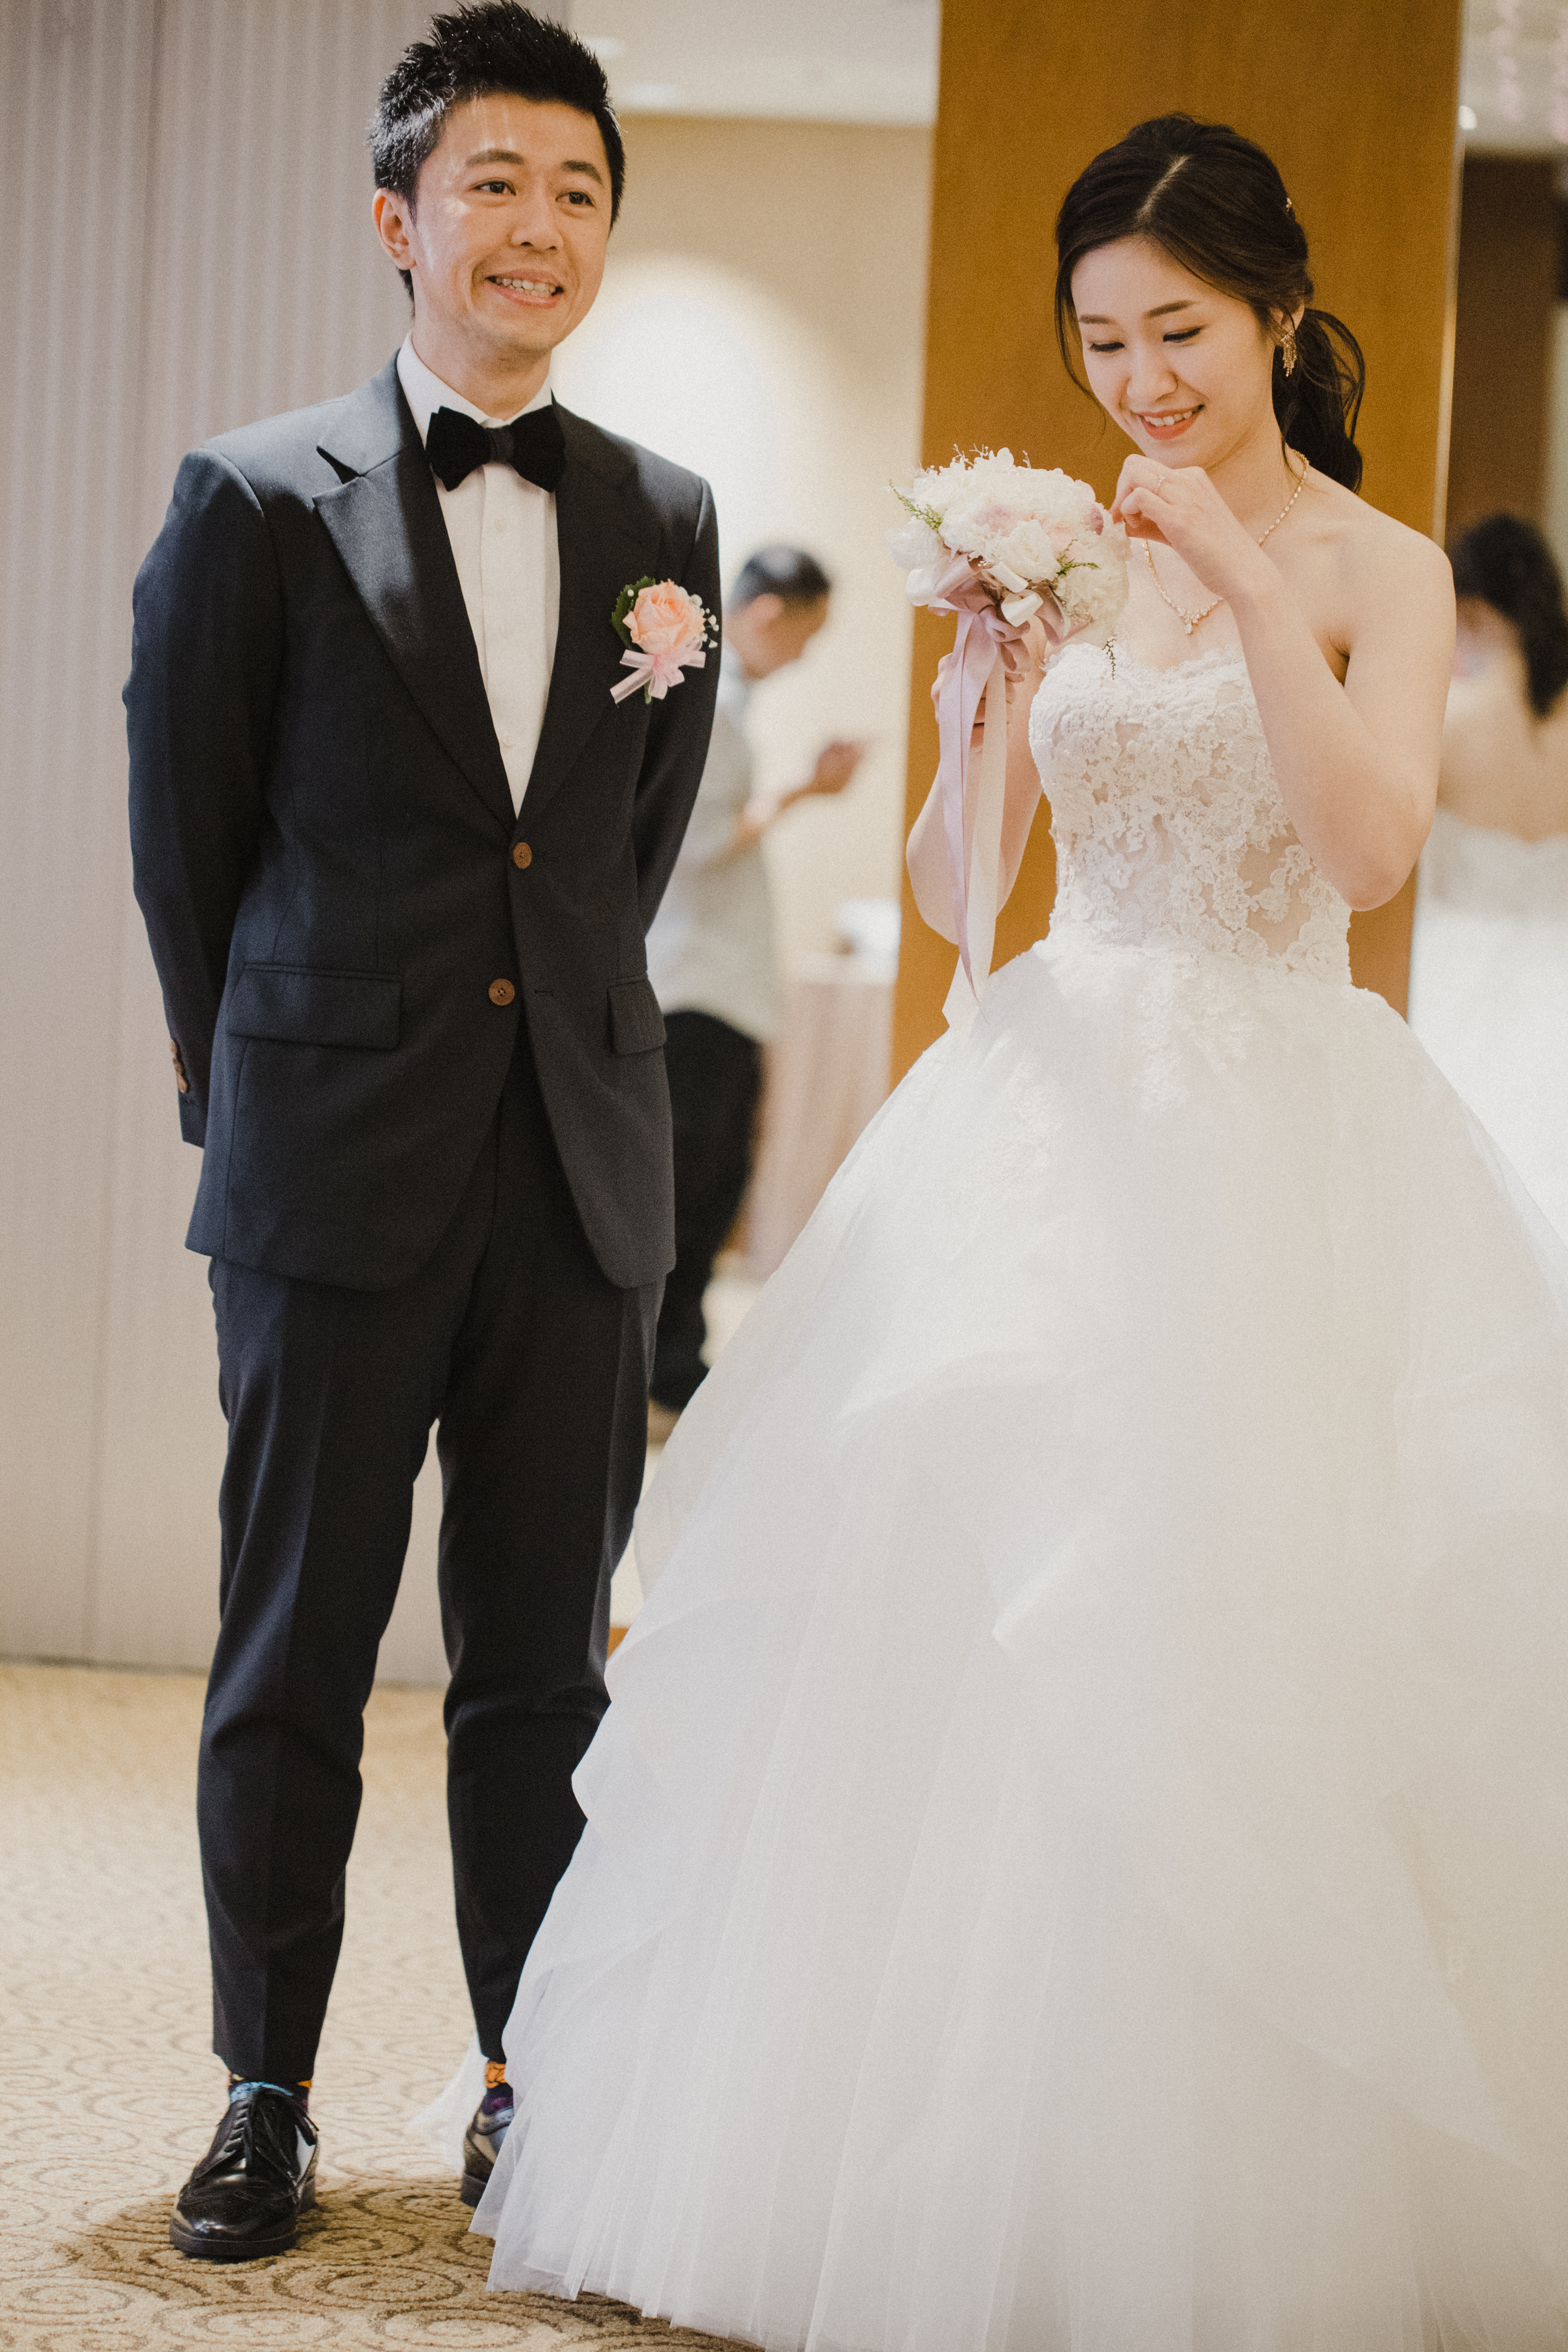 wedding-caridee-oscar-lunch-ambassador-hsinchu-結婚午宴-新竹國賓_53.jpg